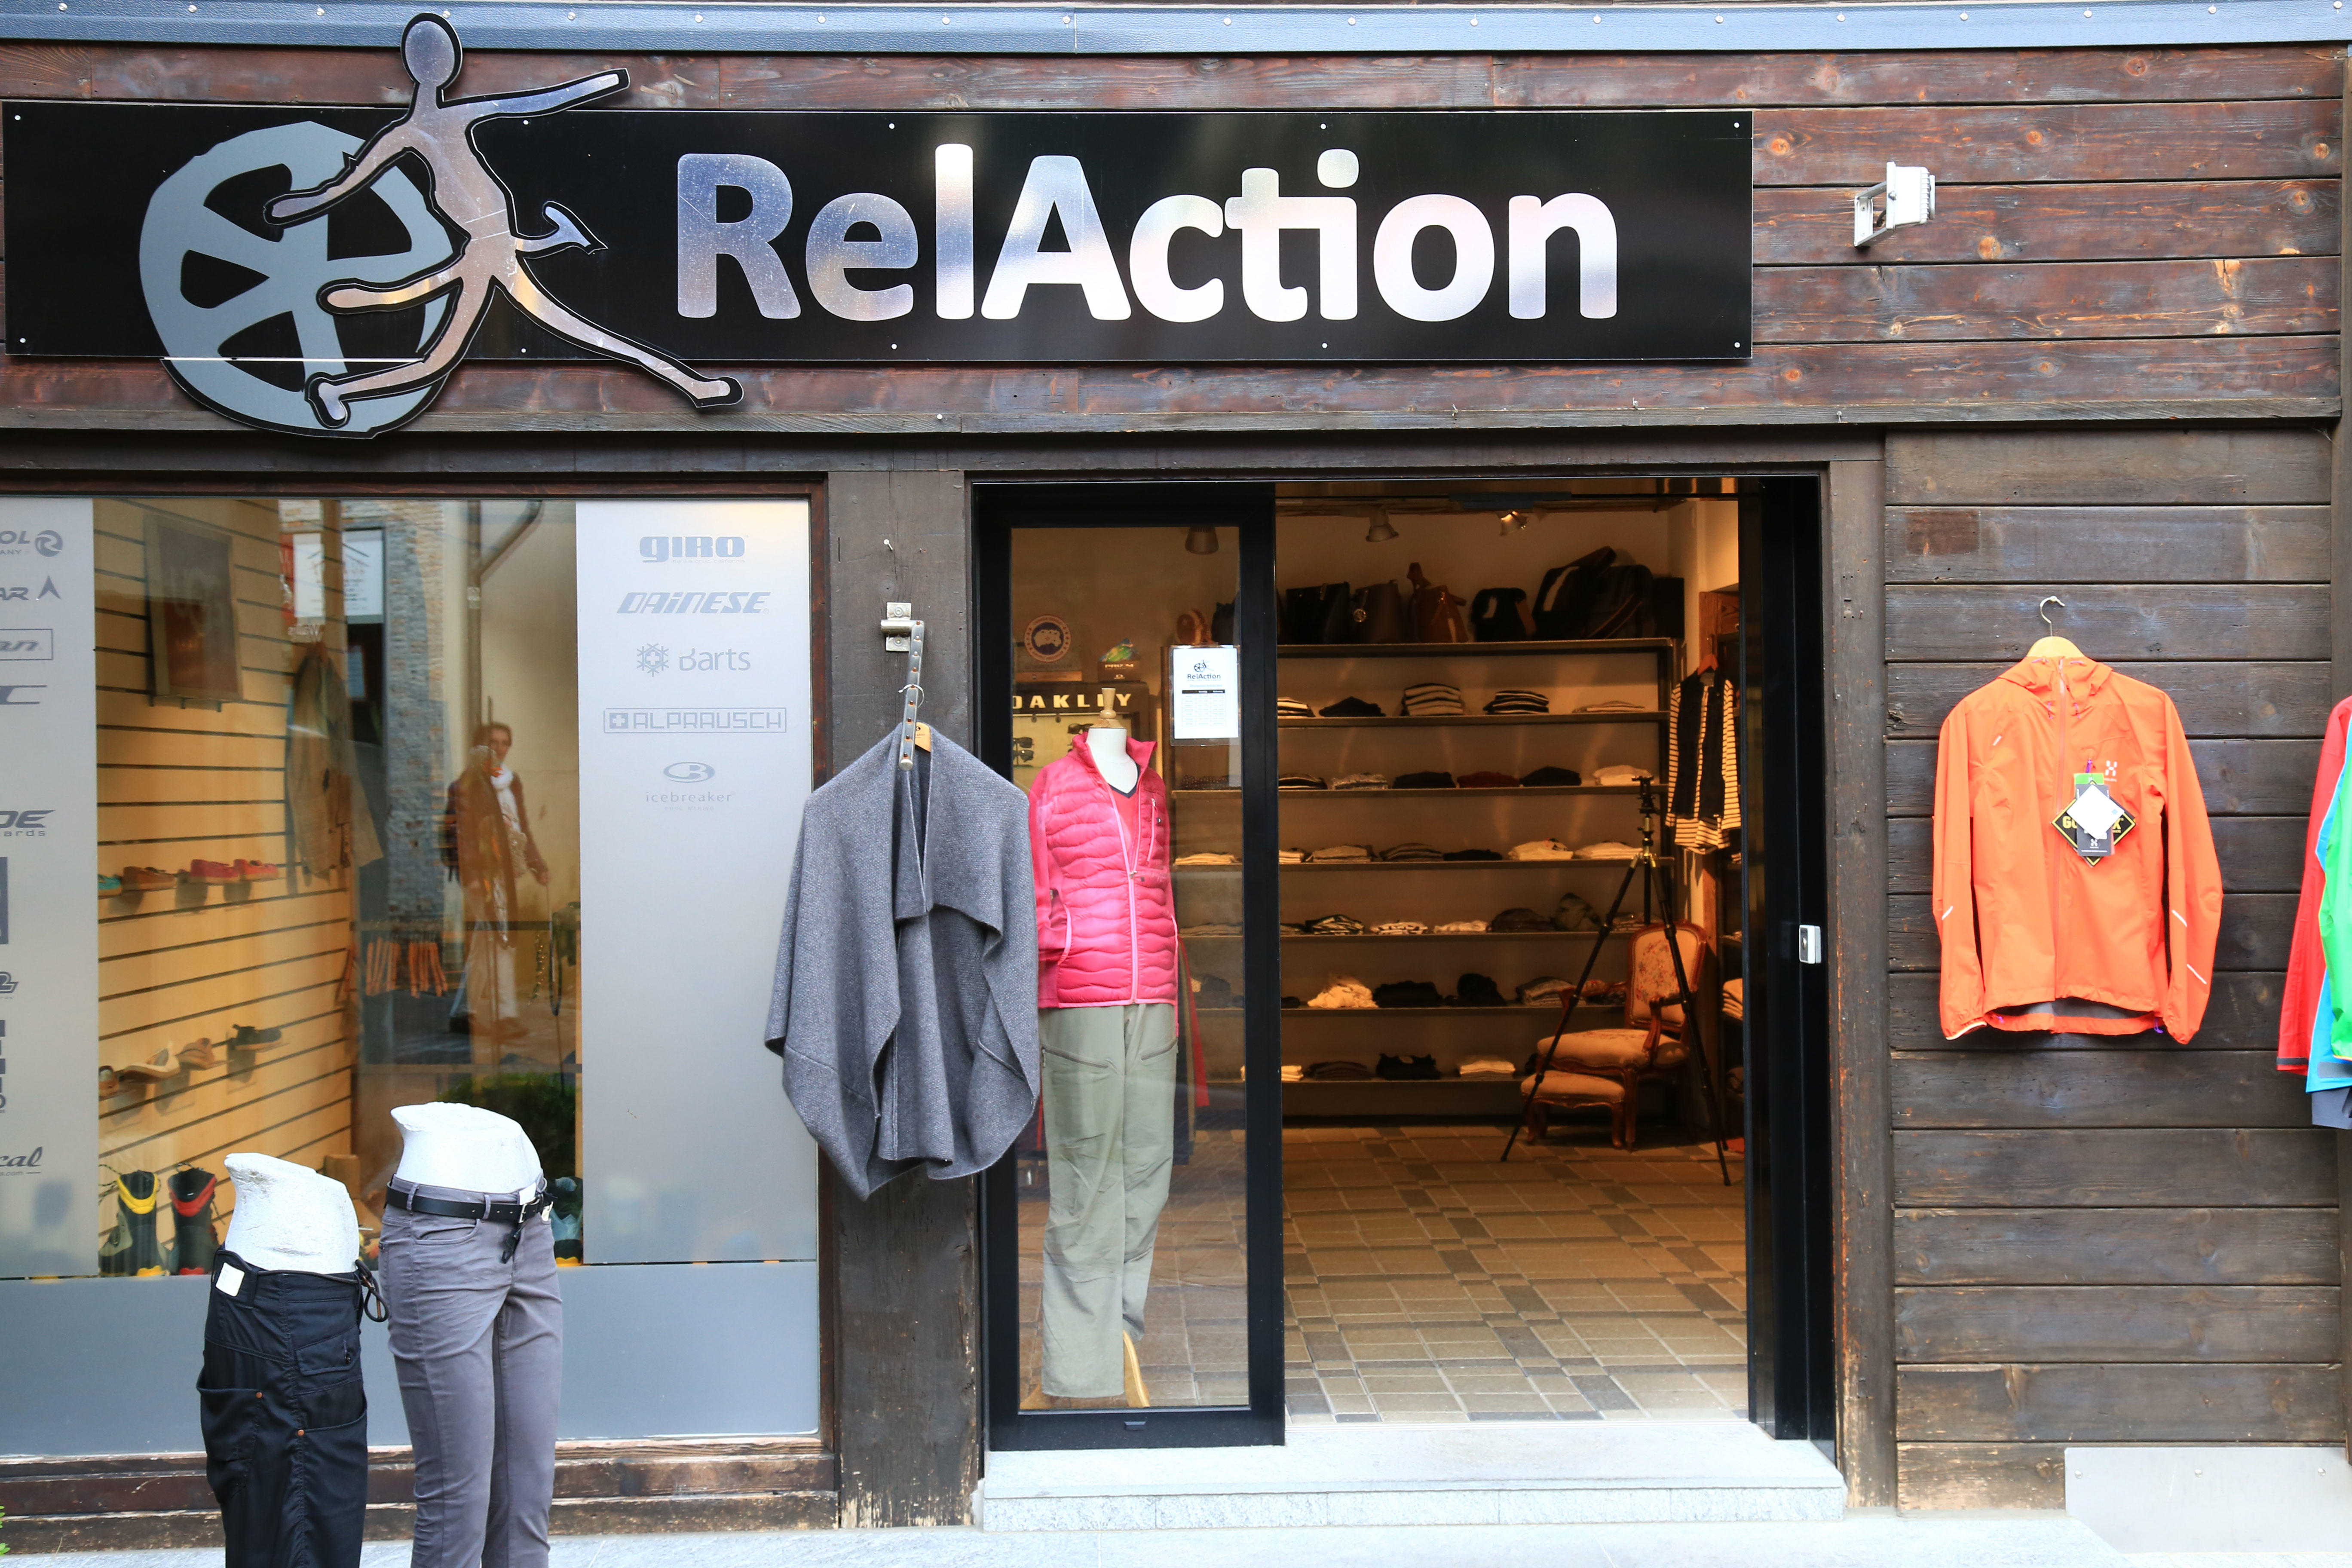 RelAction